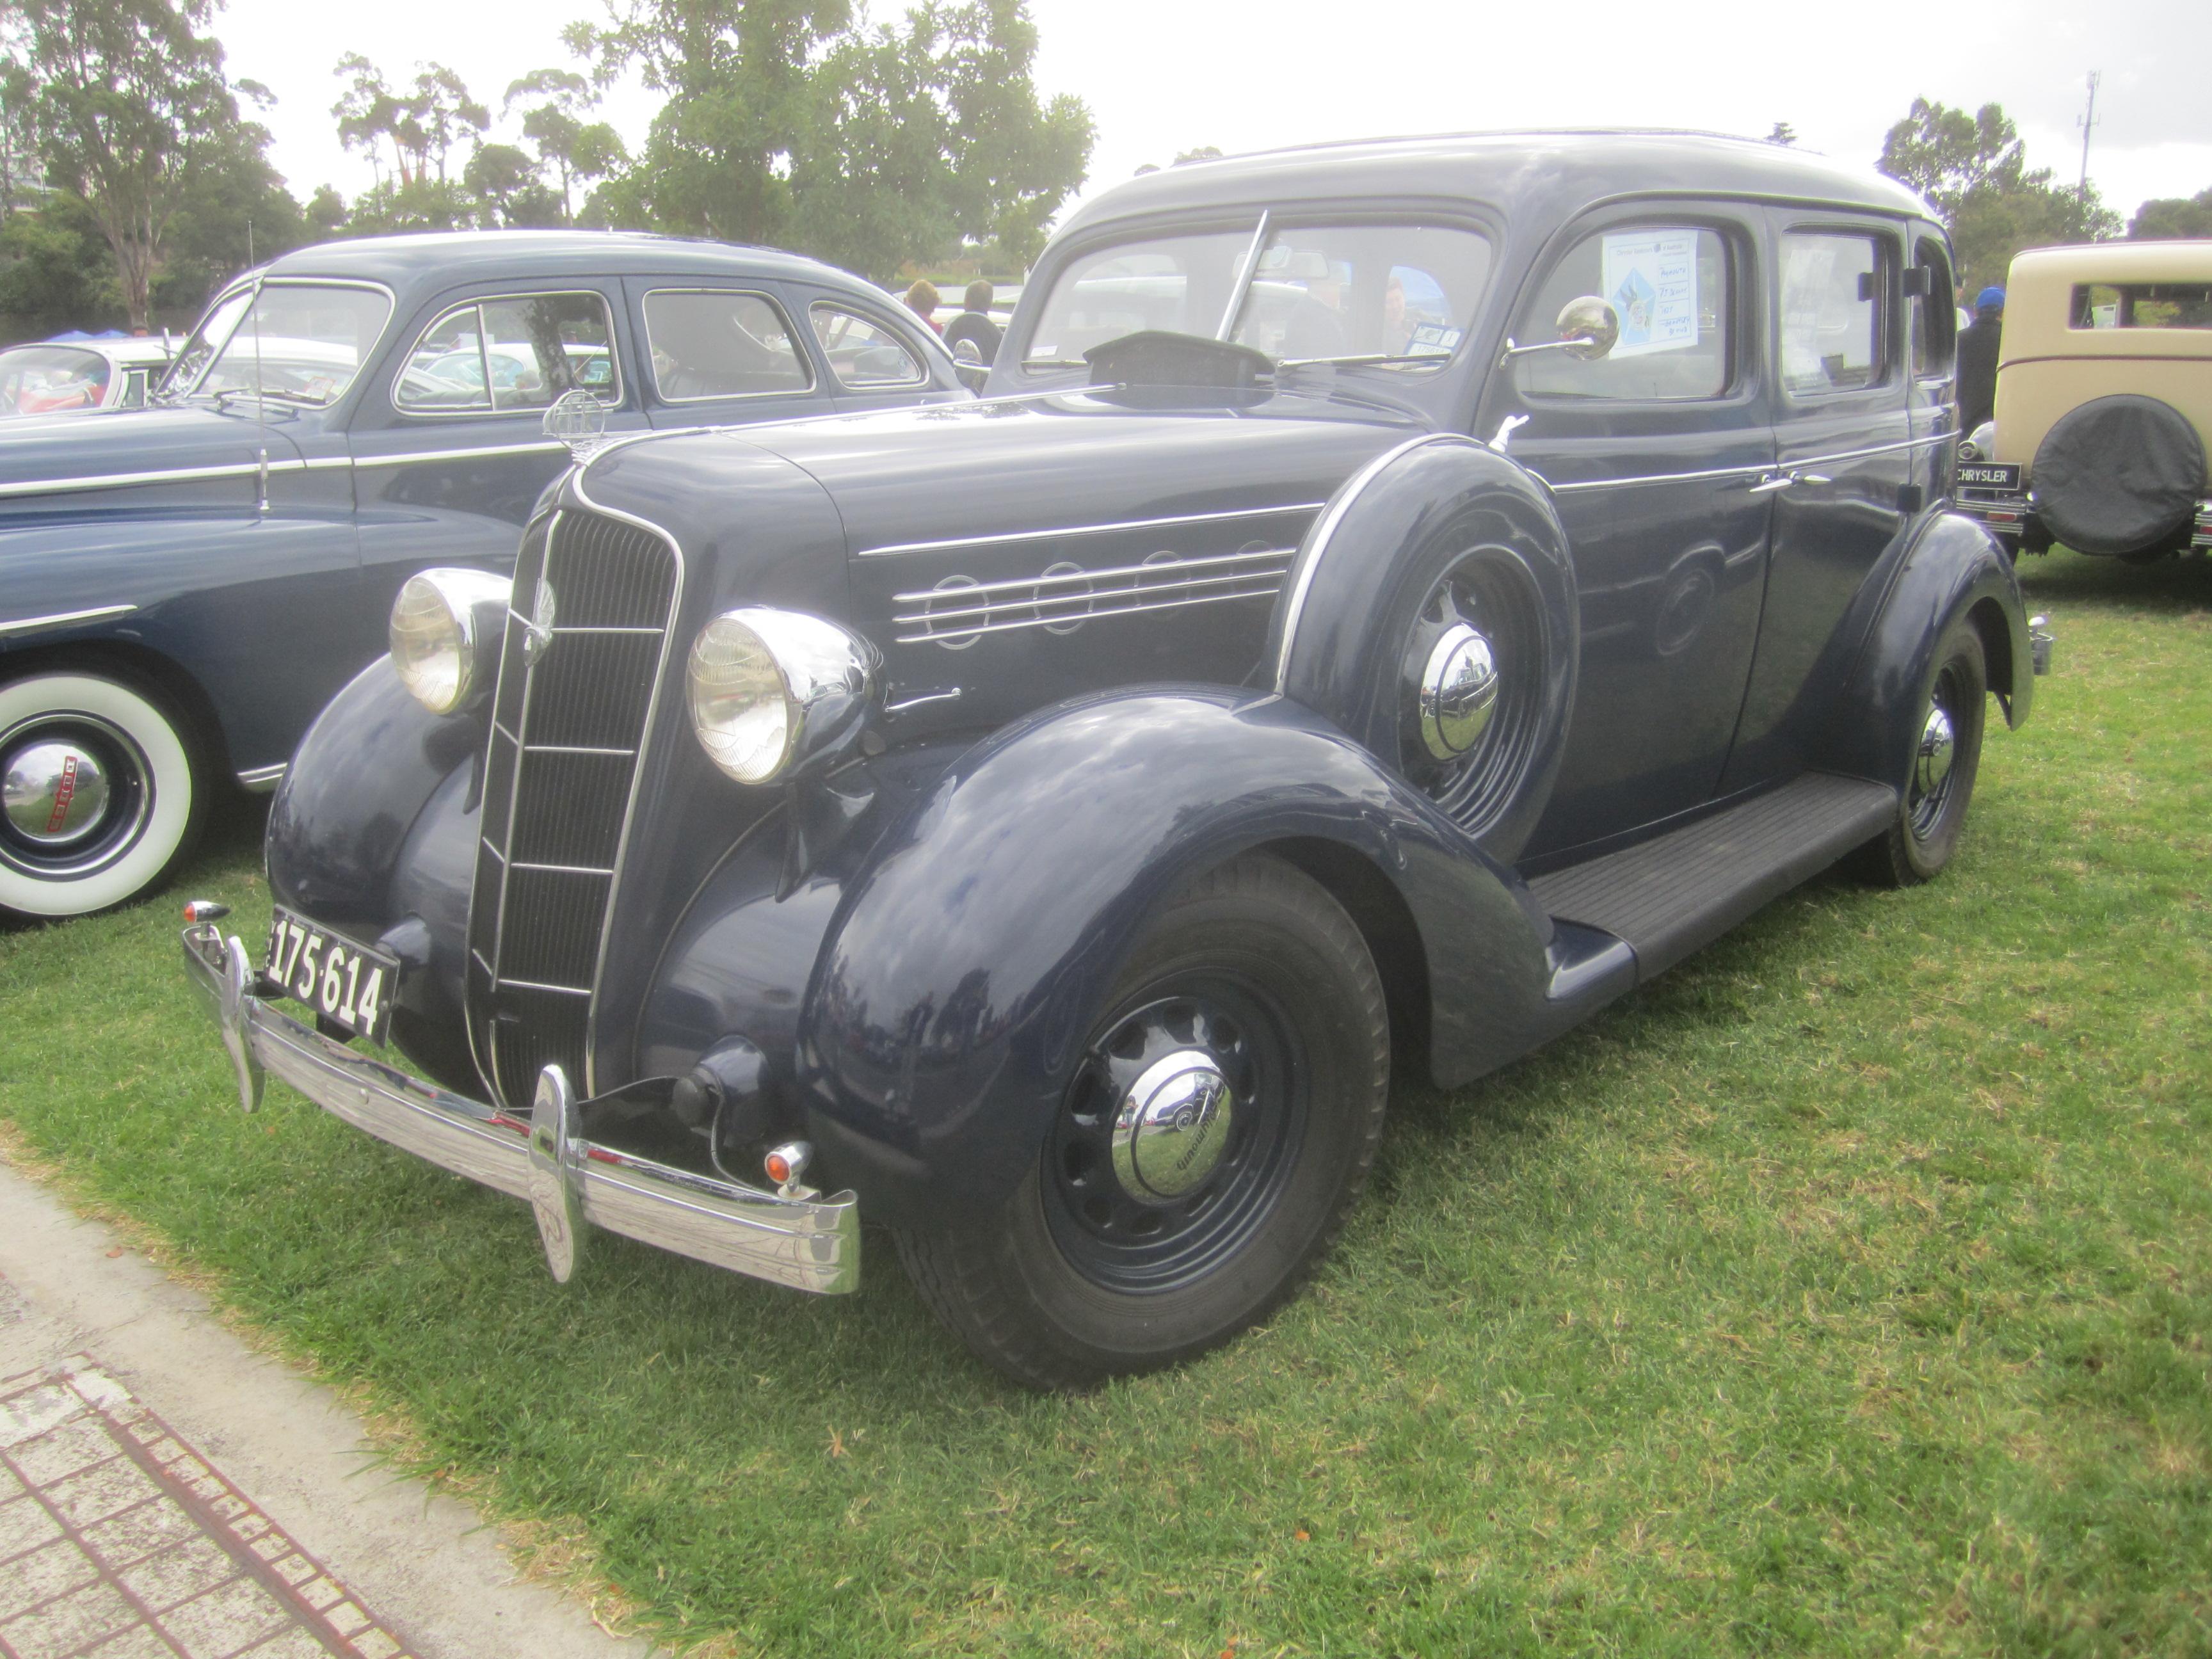 1935 Plymouth Pj 4 Door Sedan For Sale